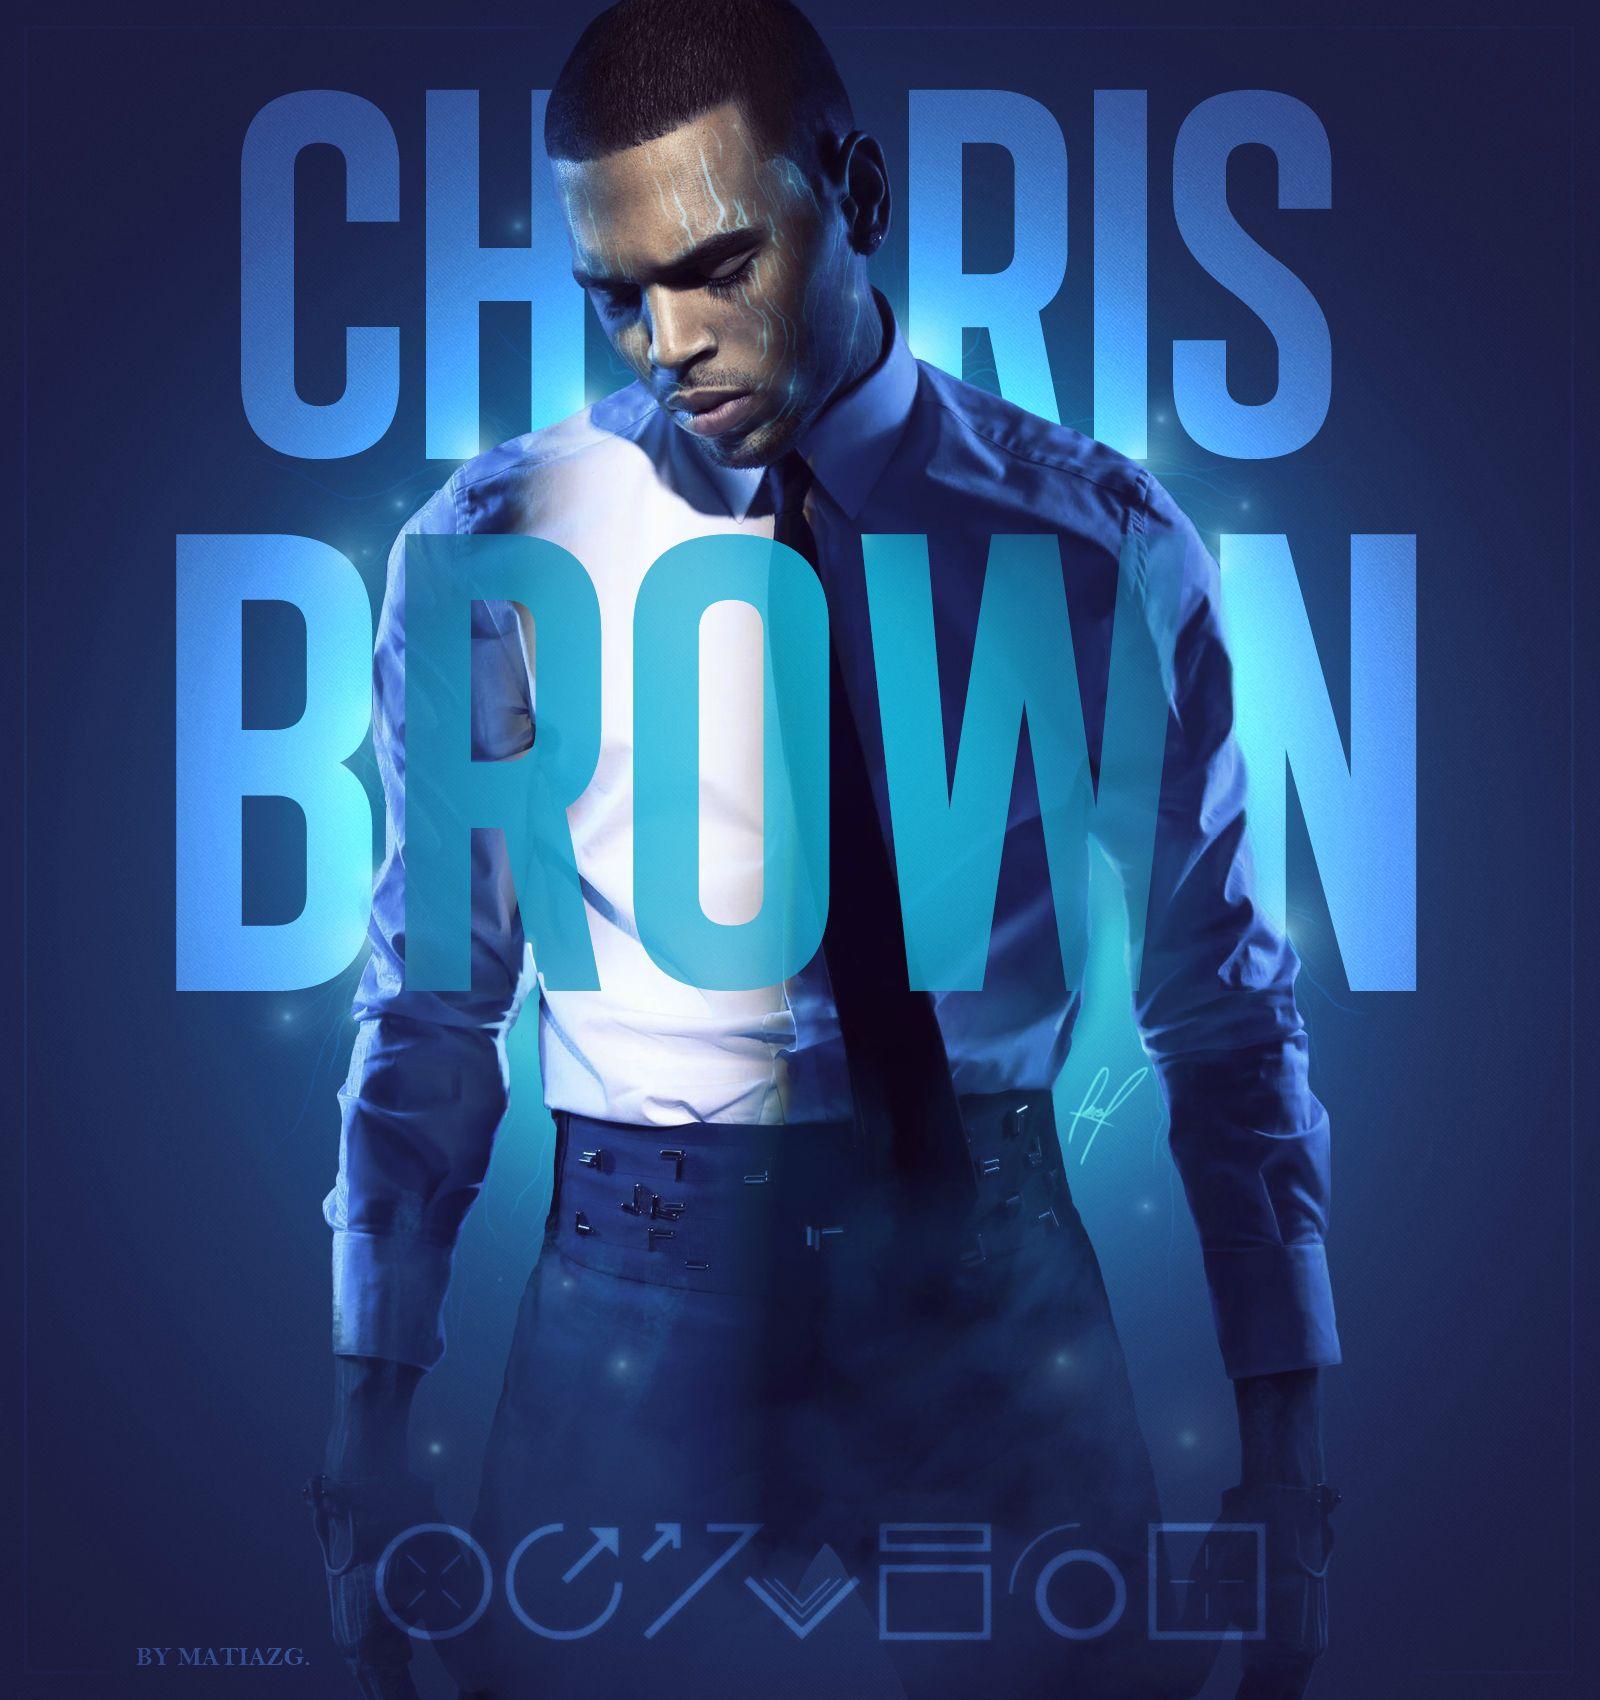 Chris Brown Fortune by matiazgdesign on DeviantArt